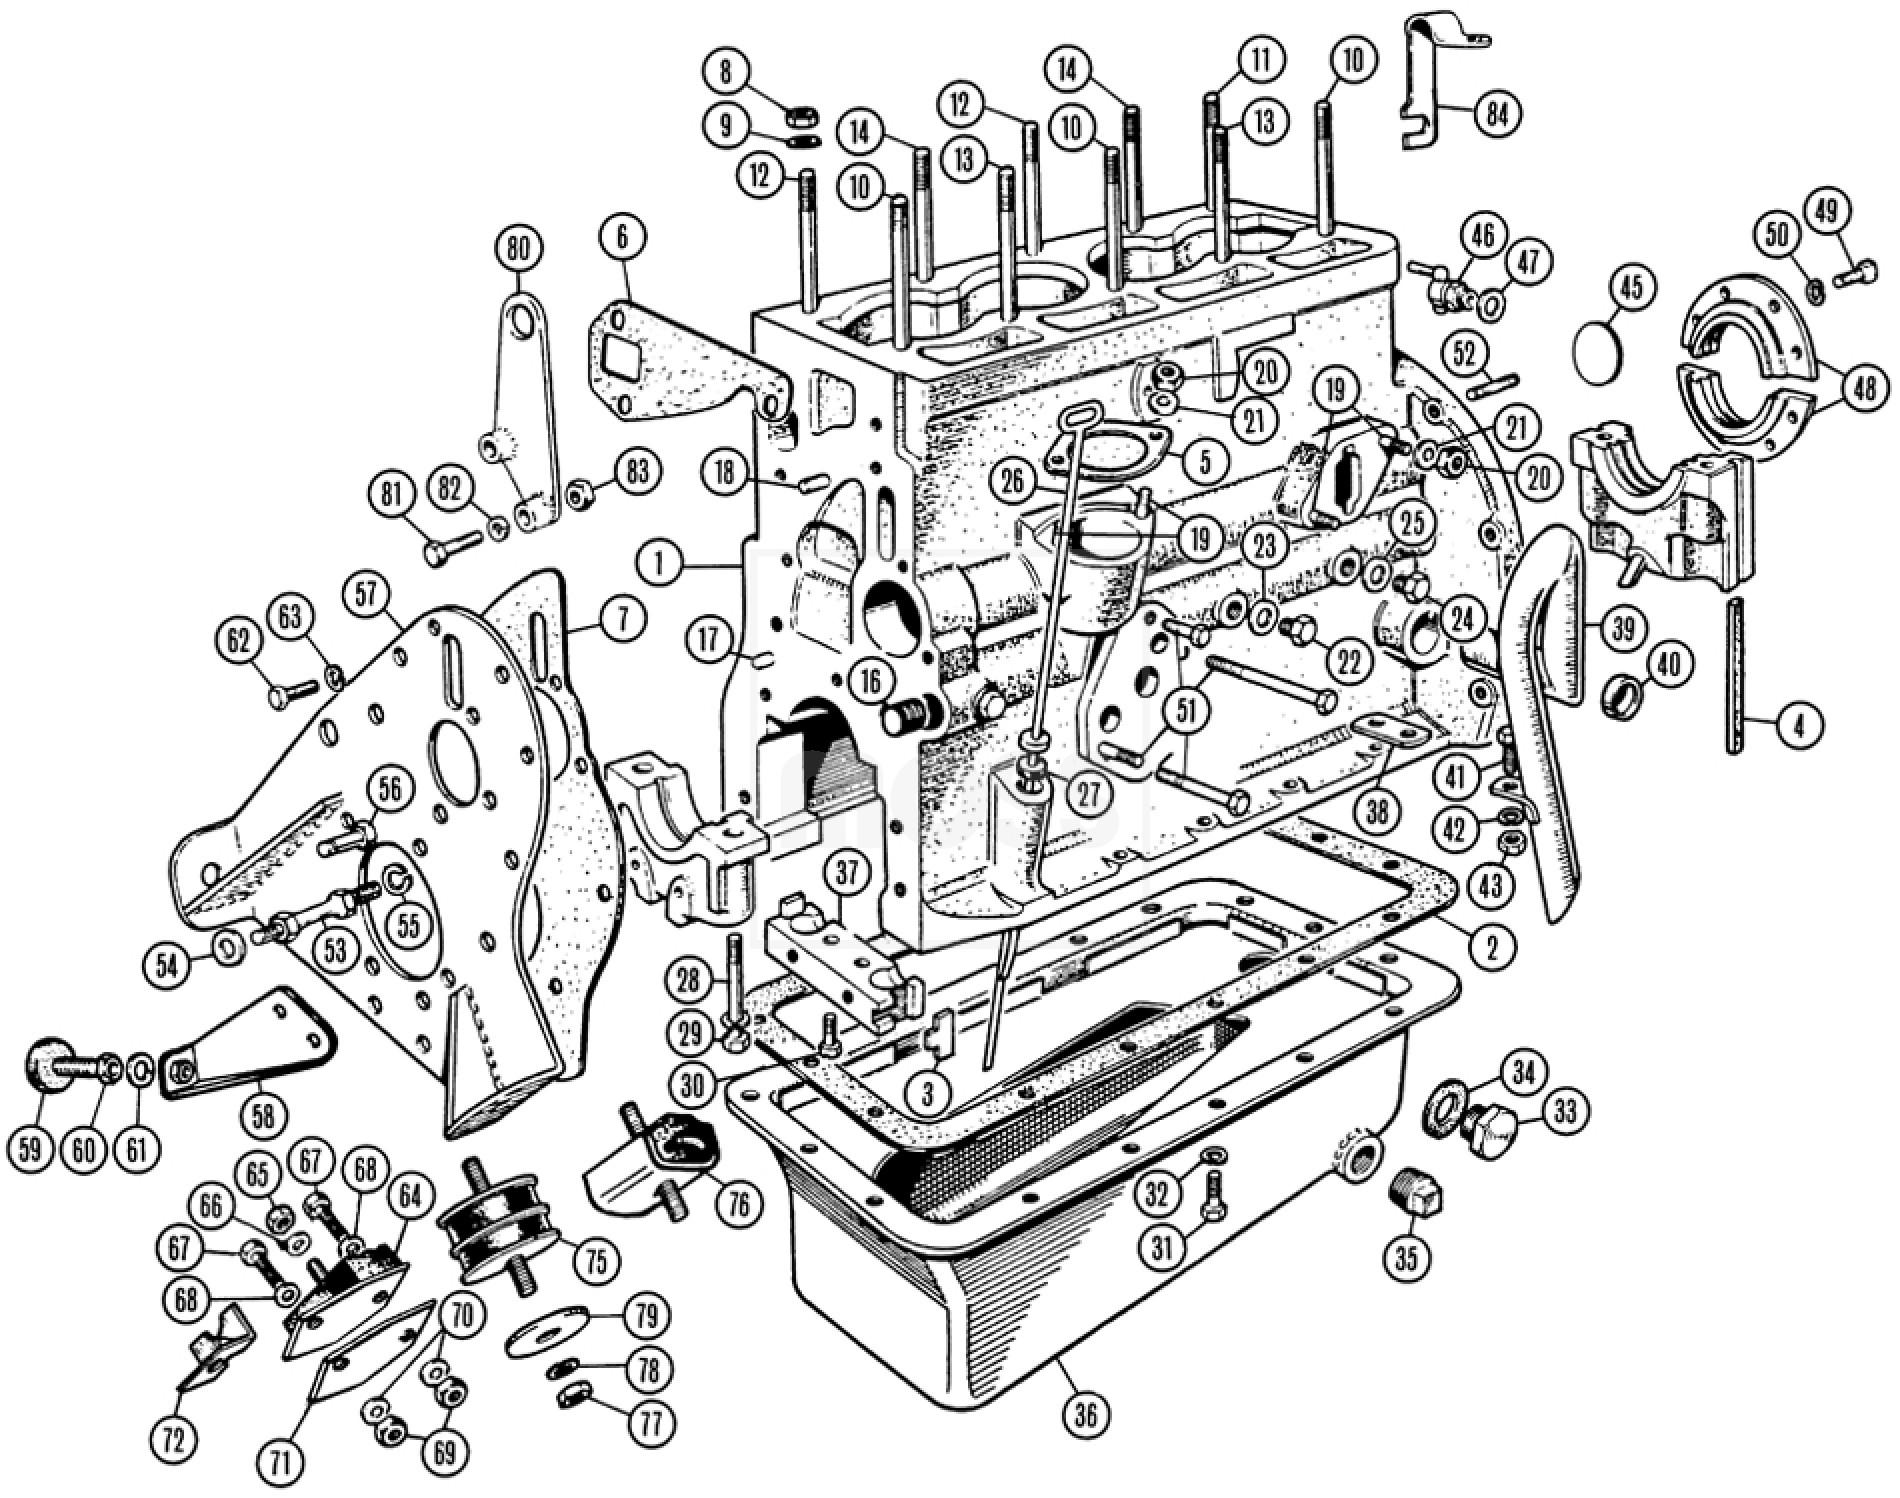 Polaris Sportsman 500 Wiring Diagram Diagram